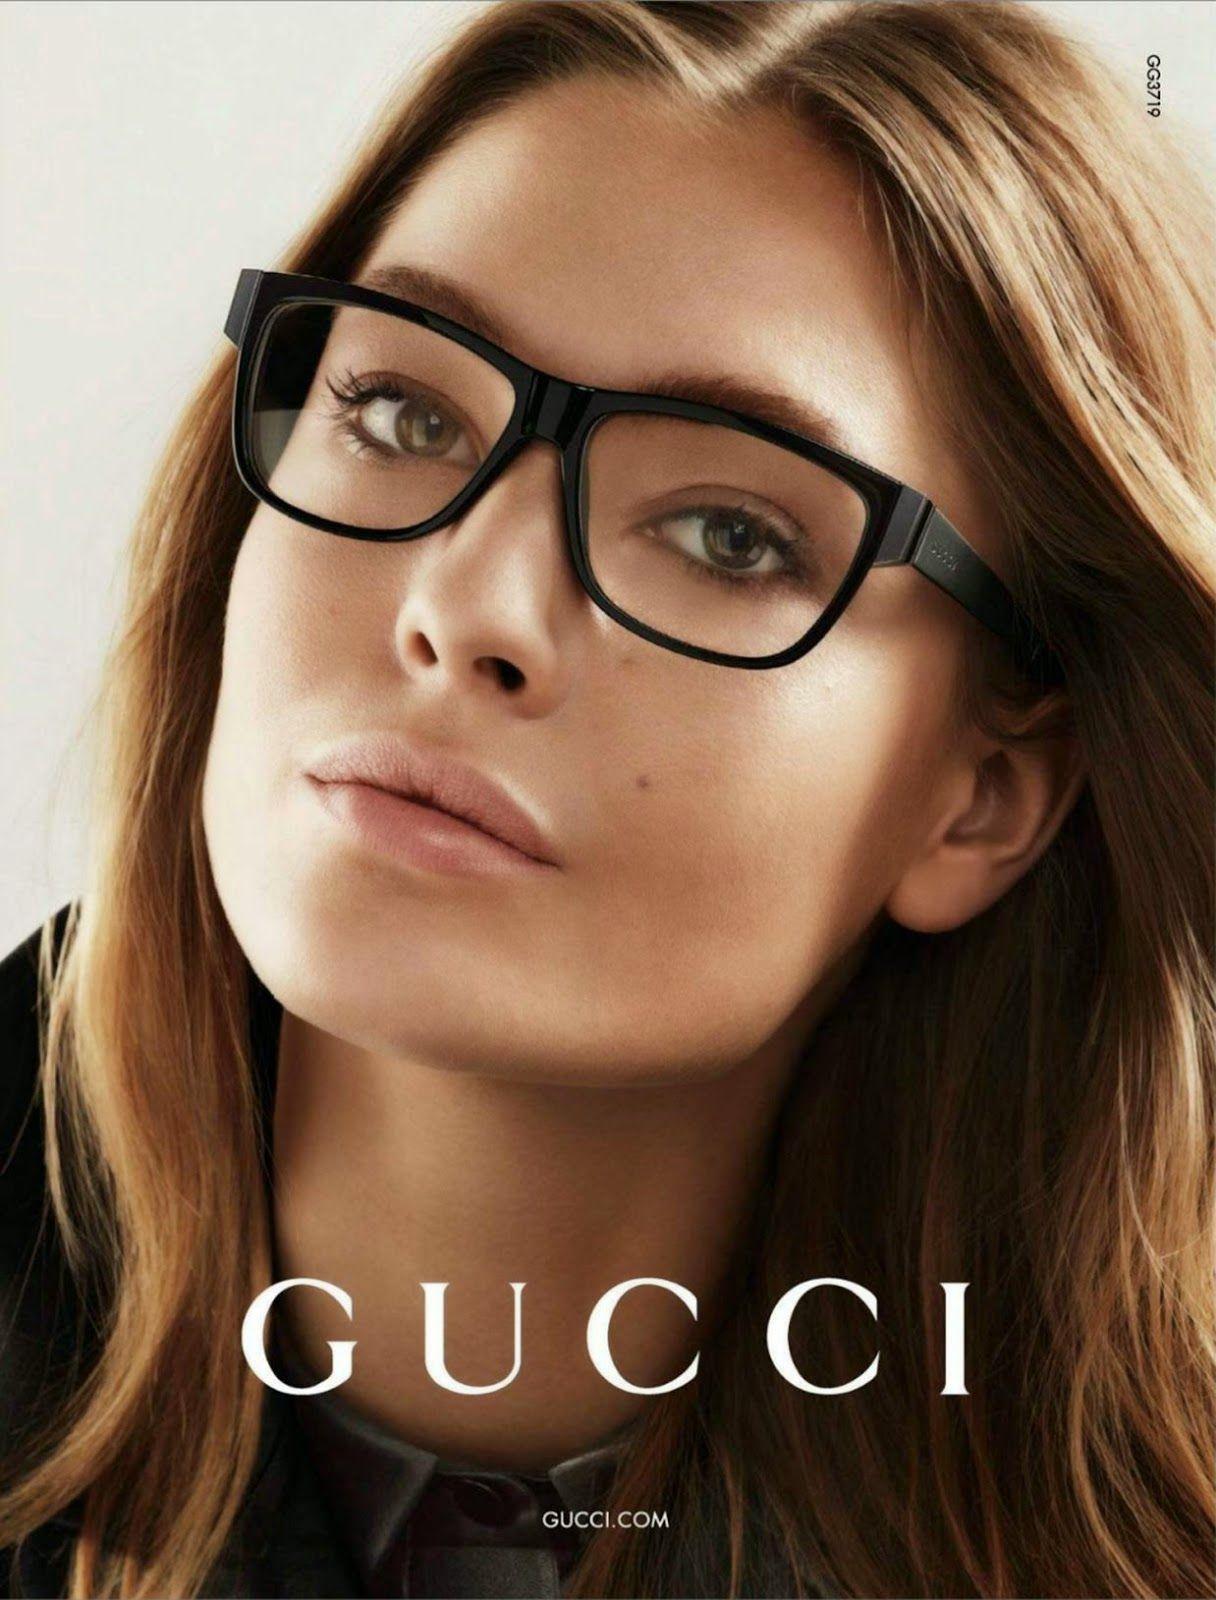 000ce4fbf Gucci otoño invierno 14/15 | Graduadas Mujer / Women Prescritption ...